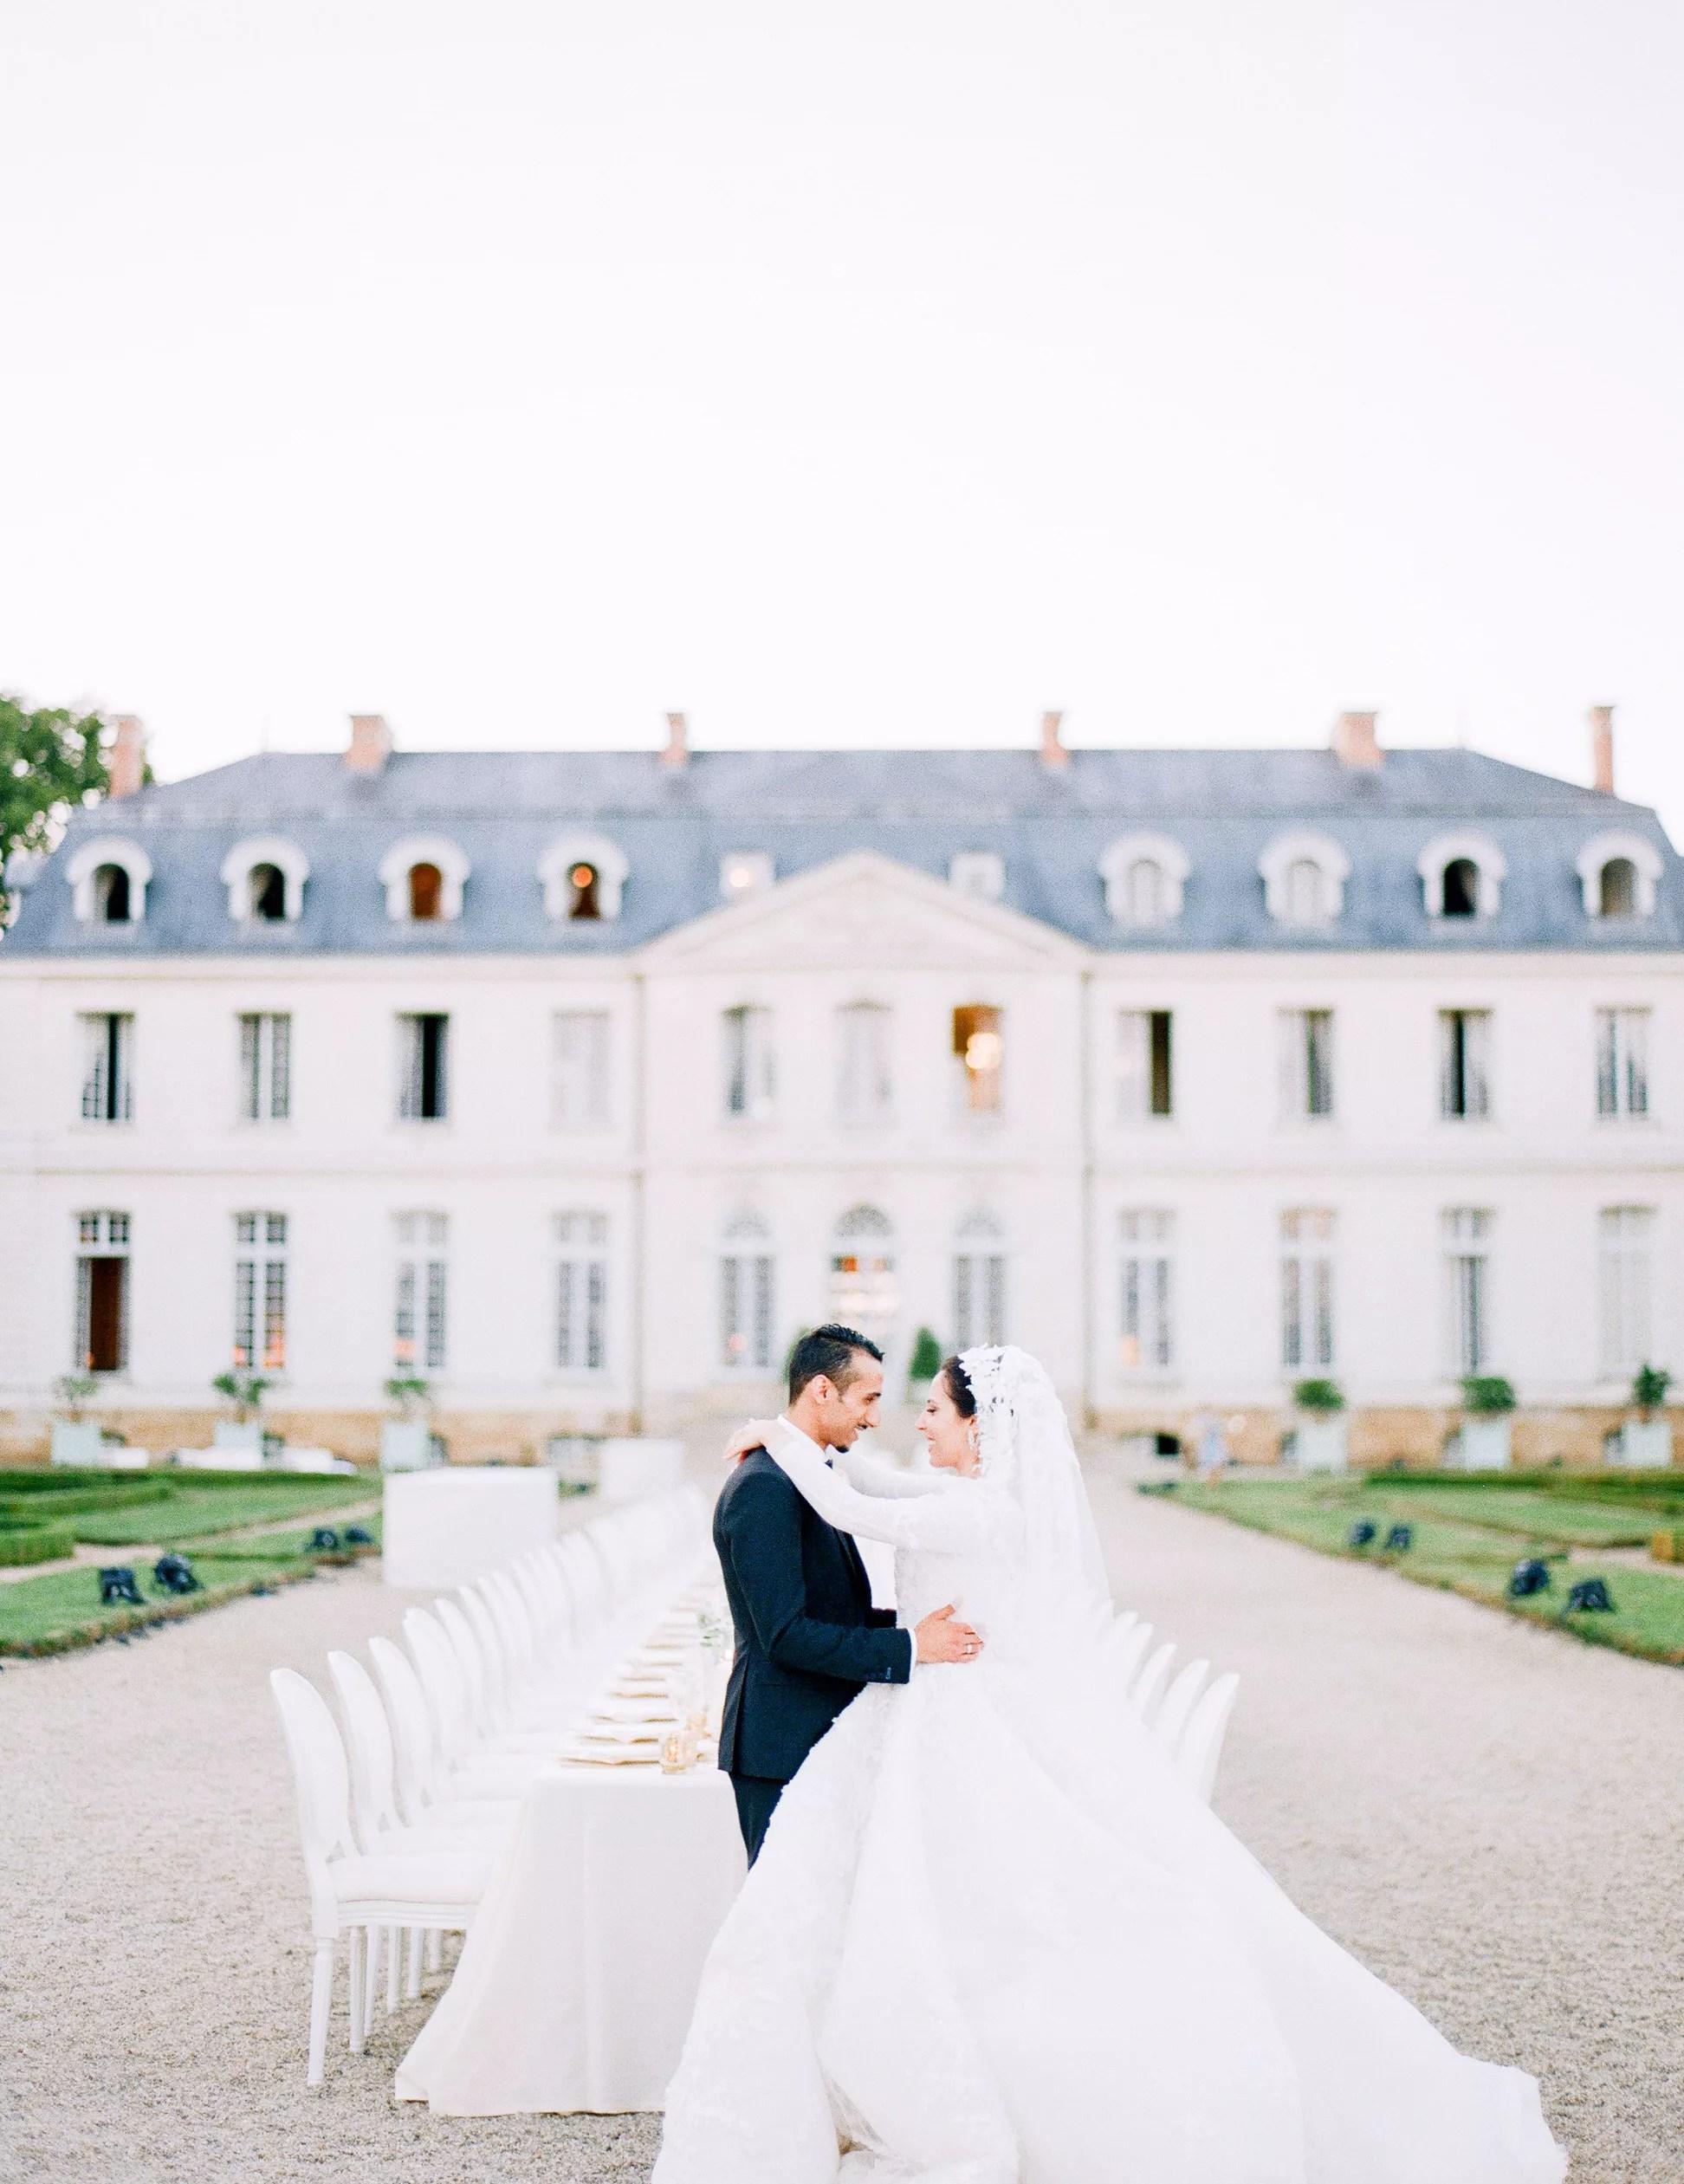 wedding-photography, wedding, destination-weddings - The French fairytale wedding Ben Yew captured